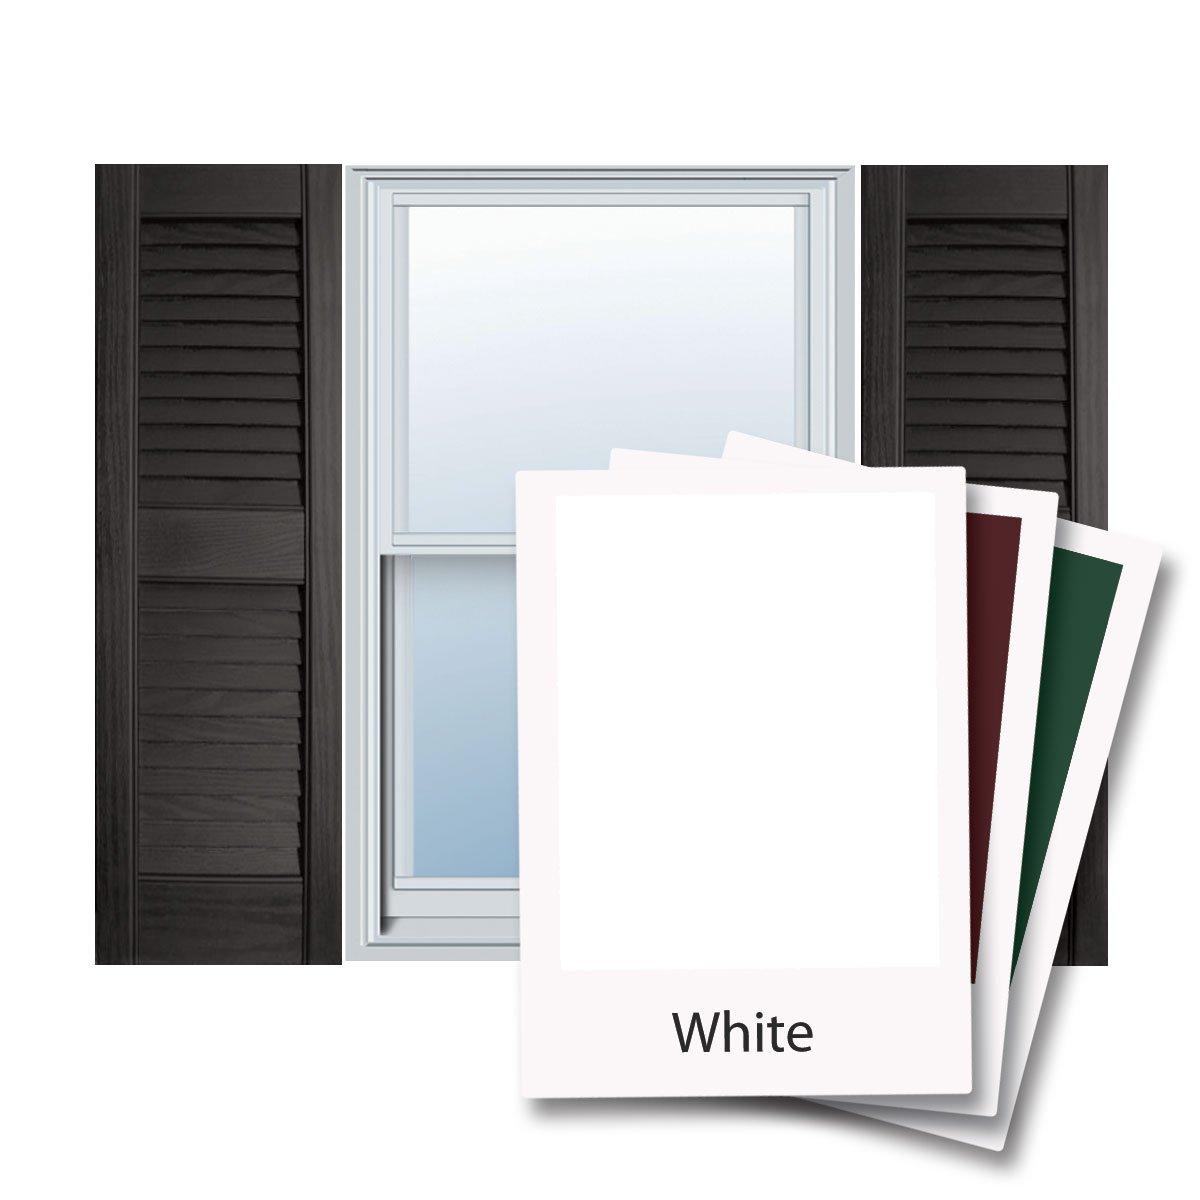 12'' x 28'' Builders Choice Vinyl Open Louver Window Shutters, w/Shutter Spikes & Screws (Per Pair), White